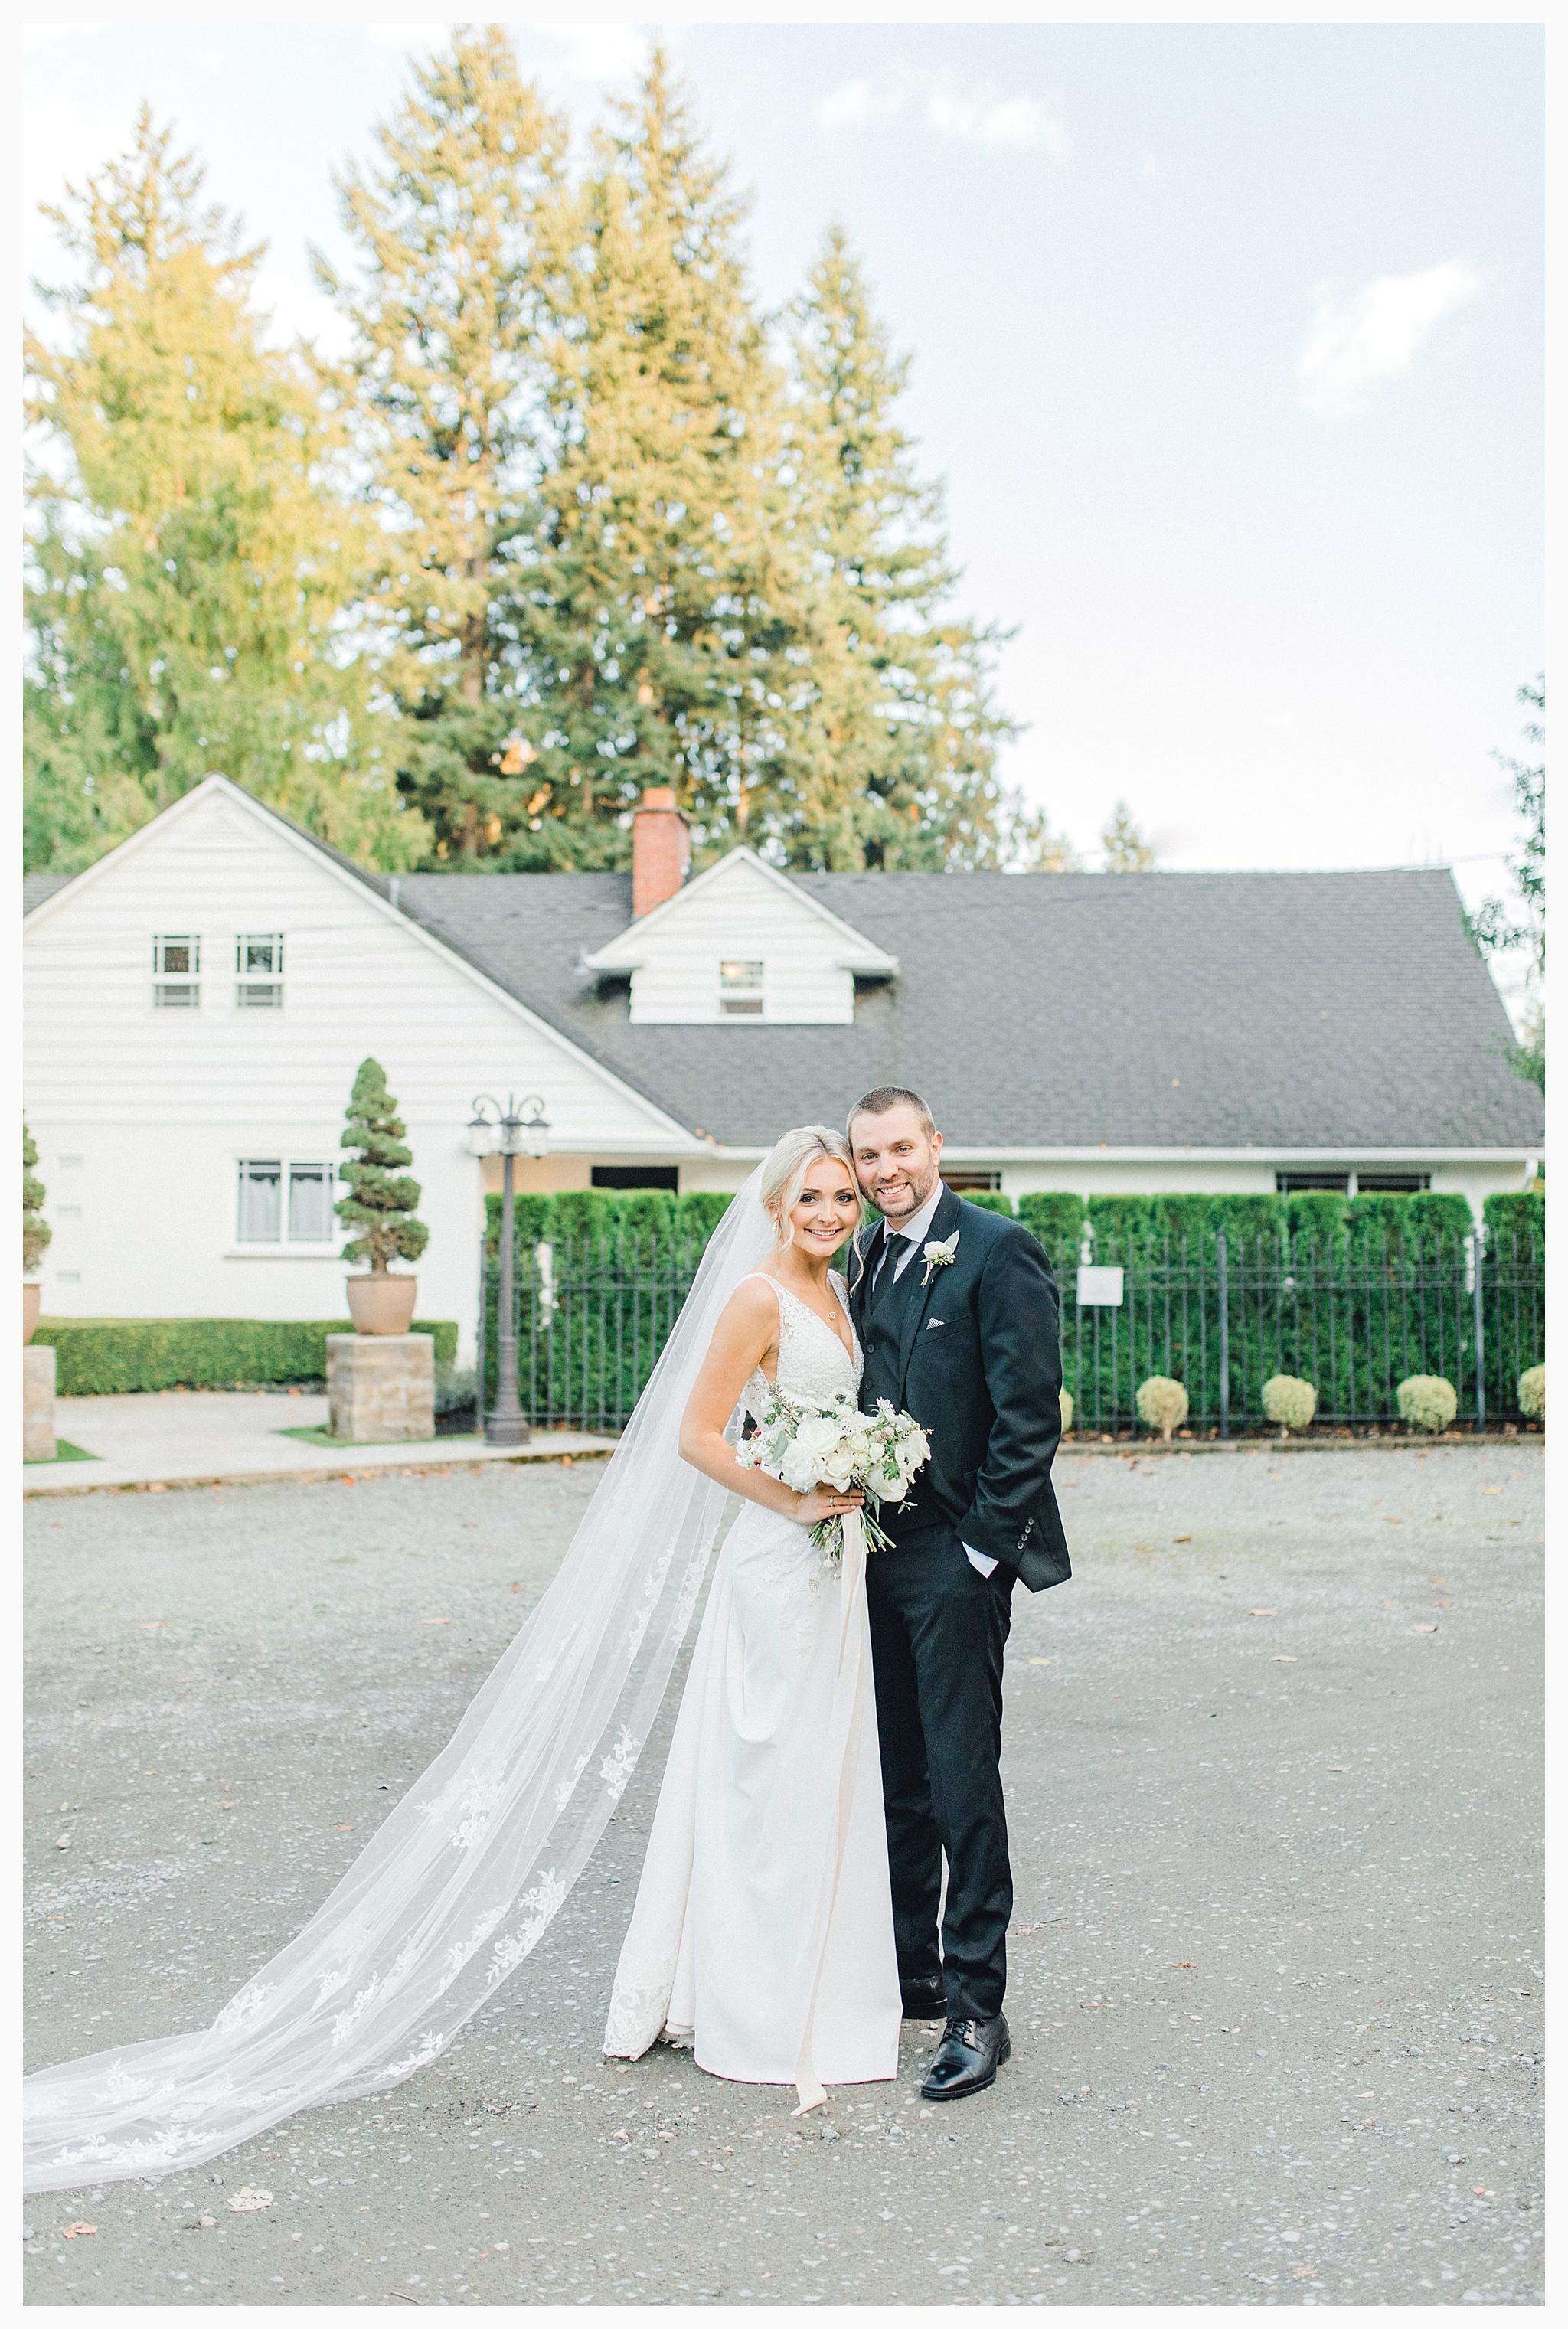 Emma Rose Company Light and Airy Wedding Photographer, Beautiful fall wedding at Rock Creek Gardens Venue in Puyallup, Washington._0086.jpg